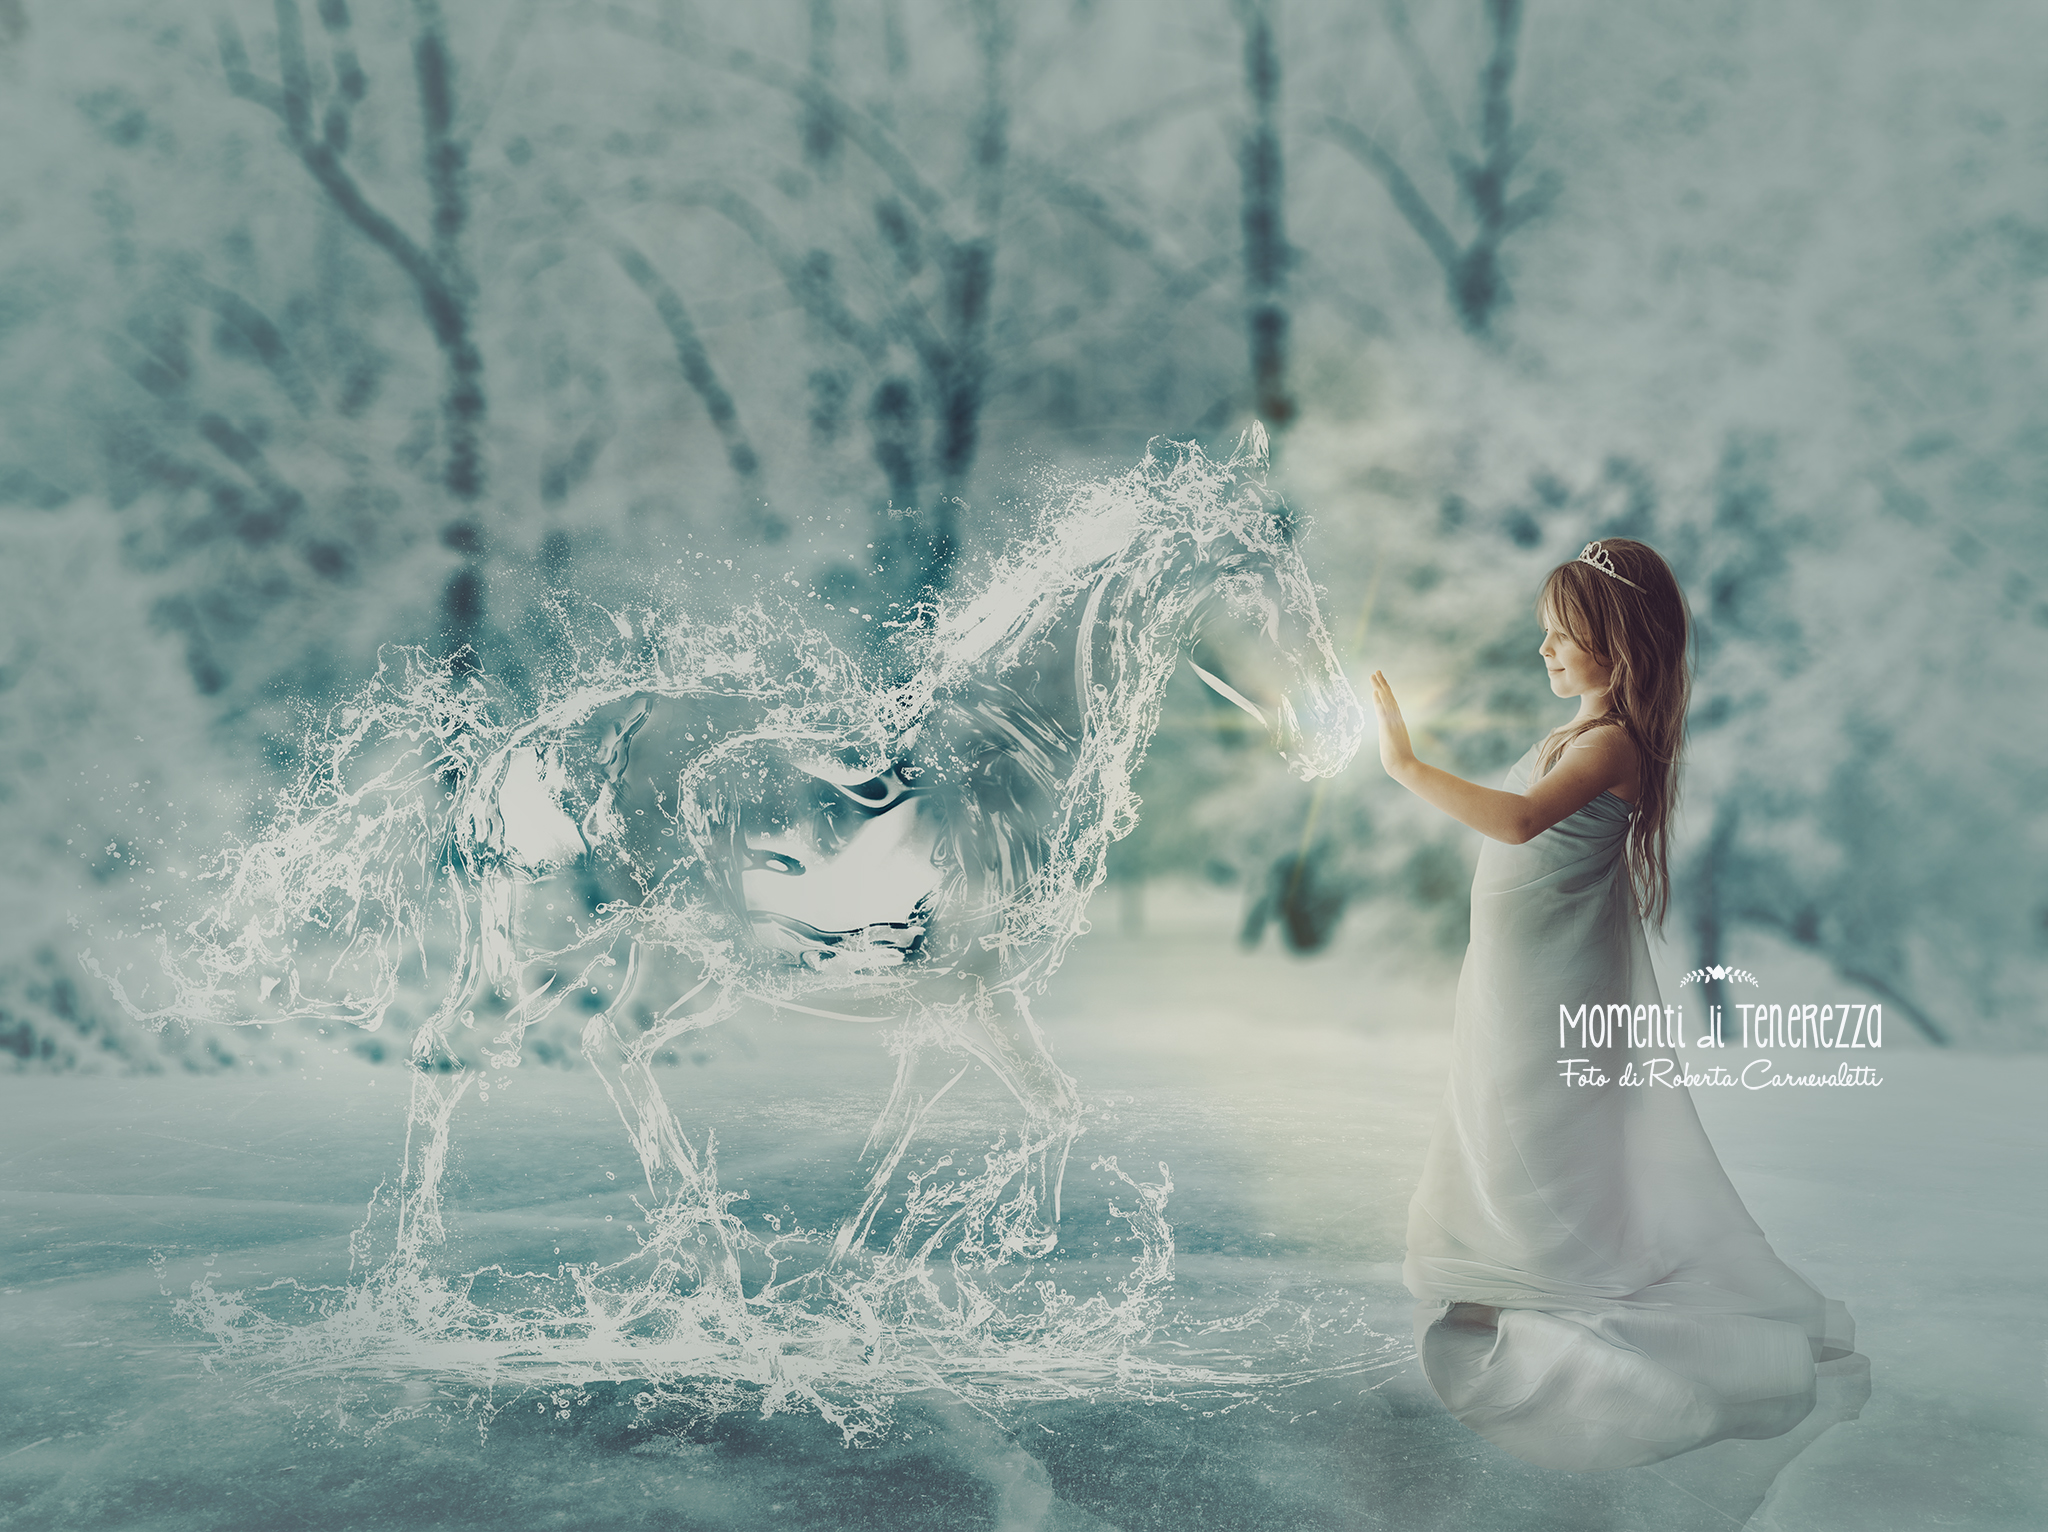 foto frozen elsa